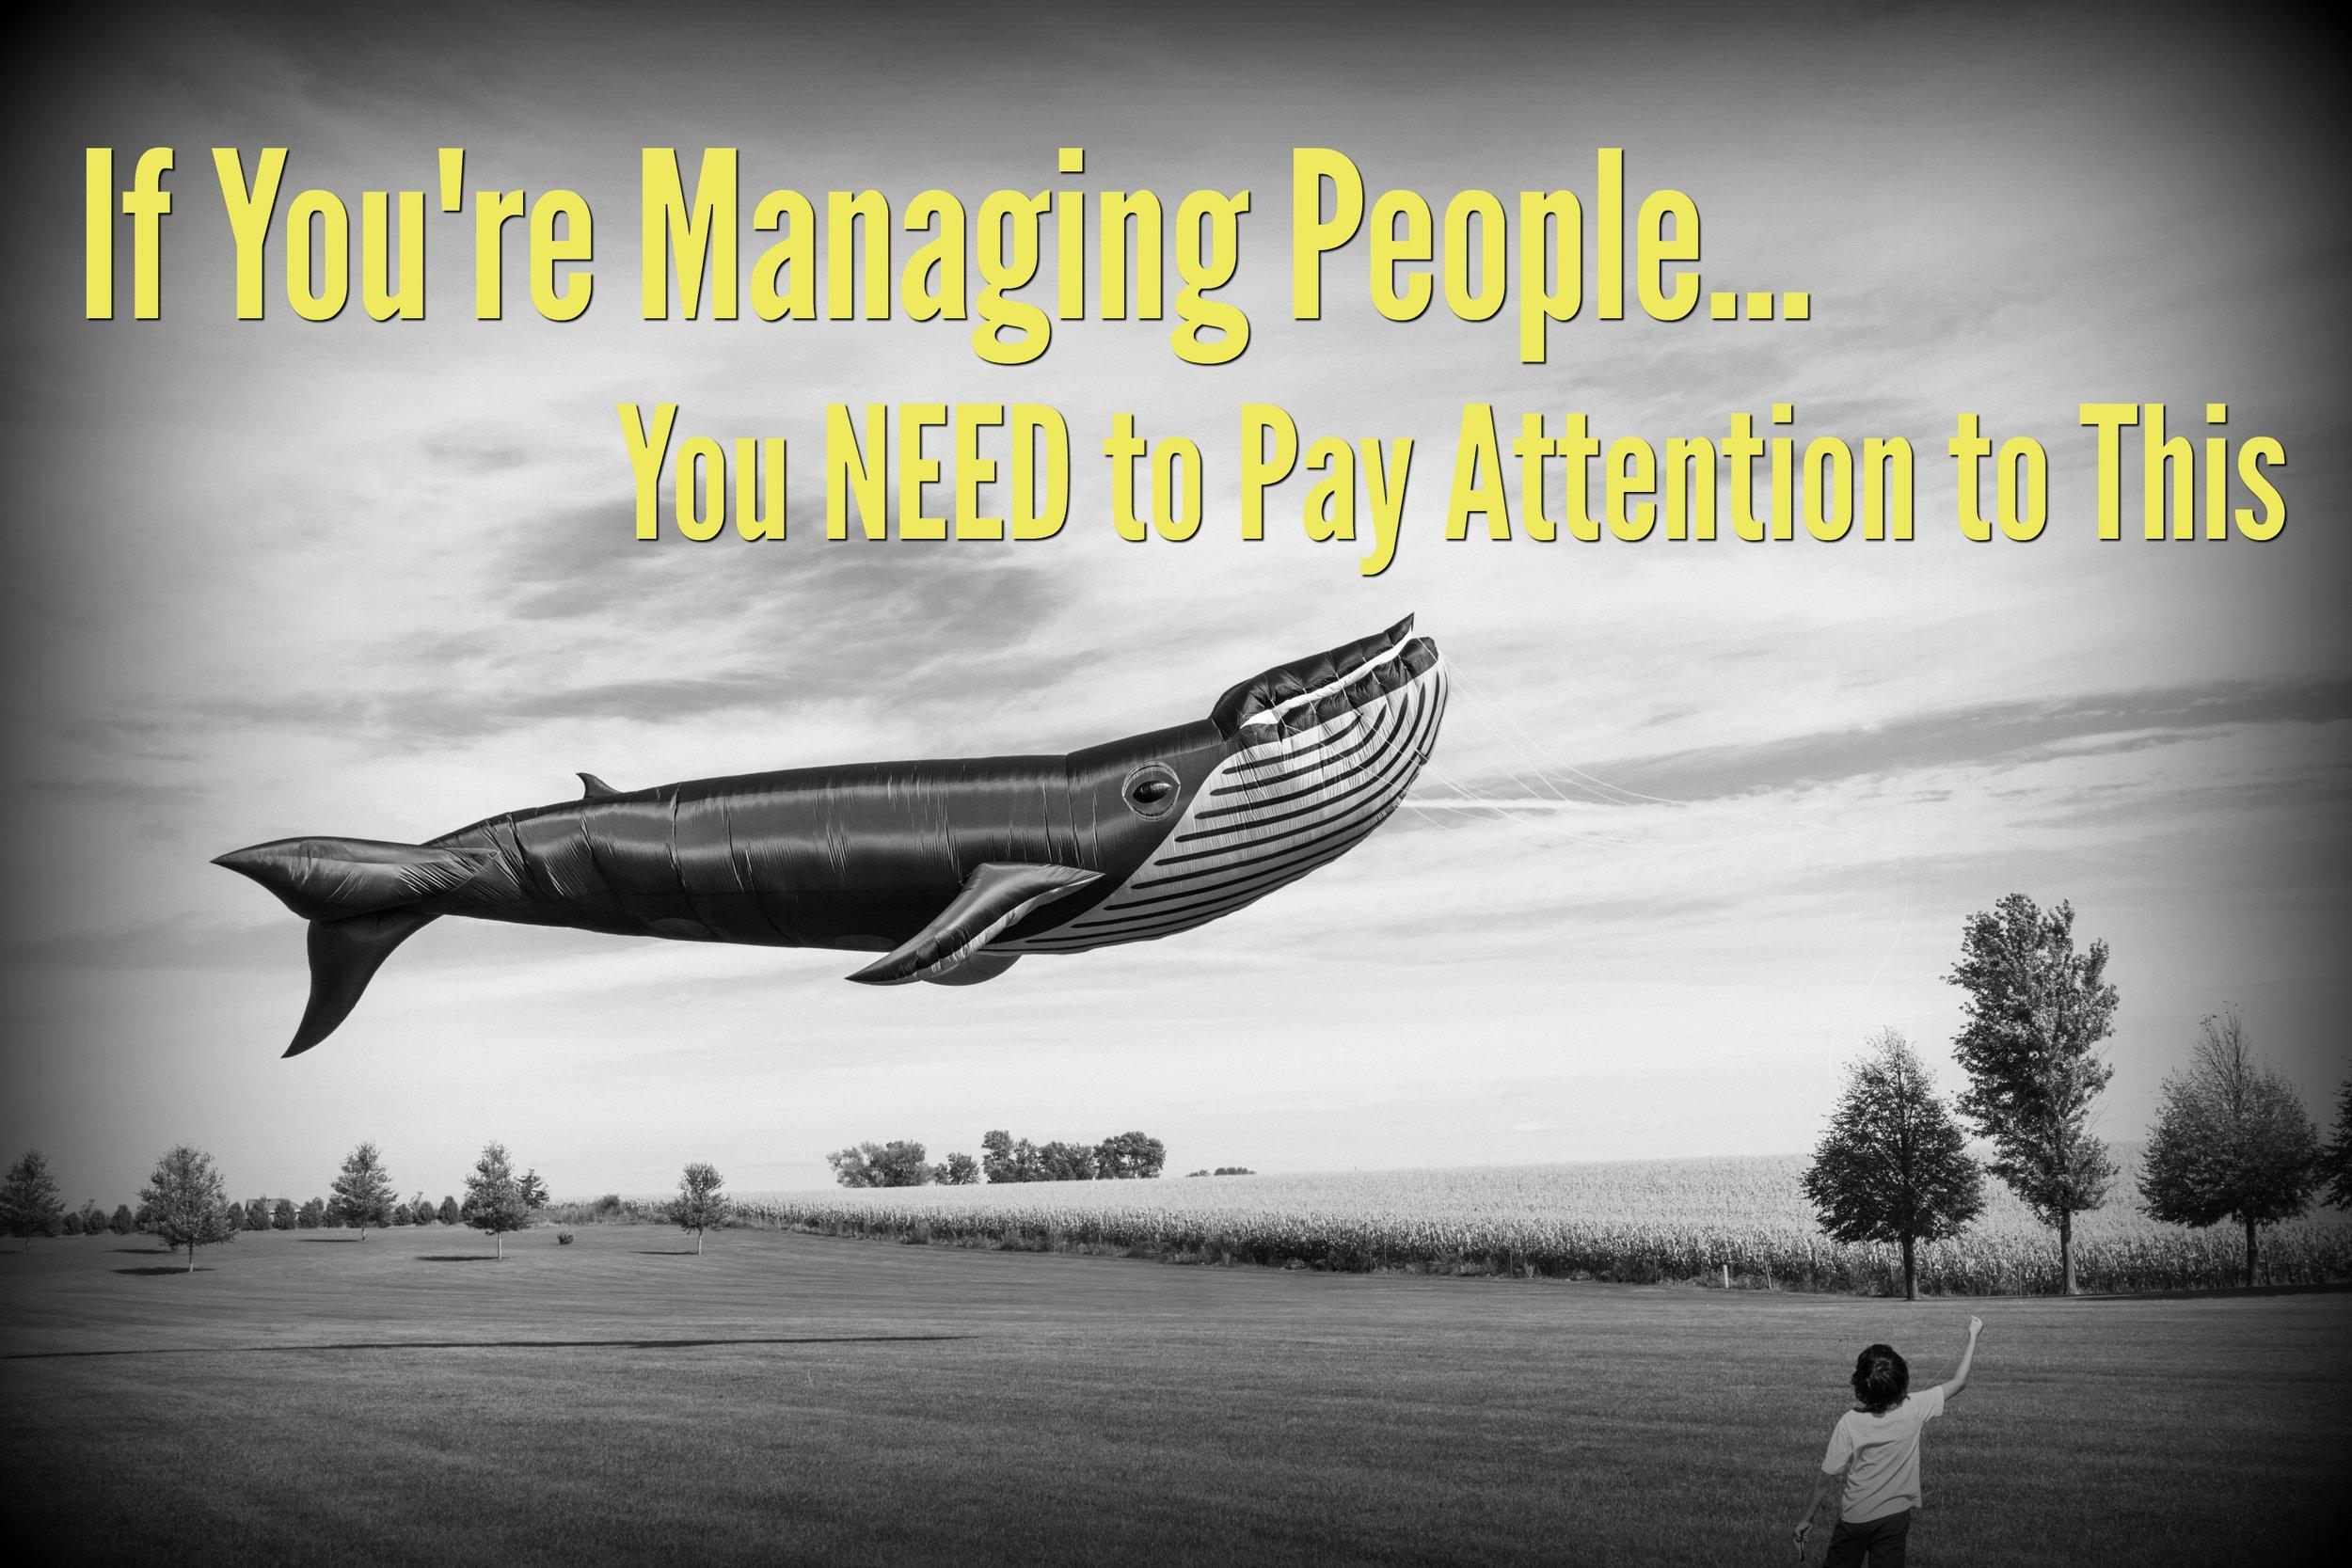 If you're managing people....jpg